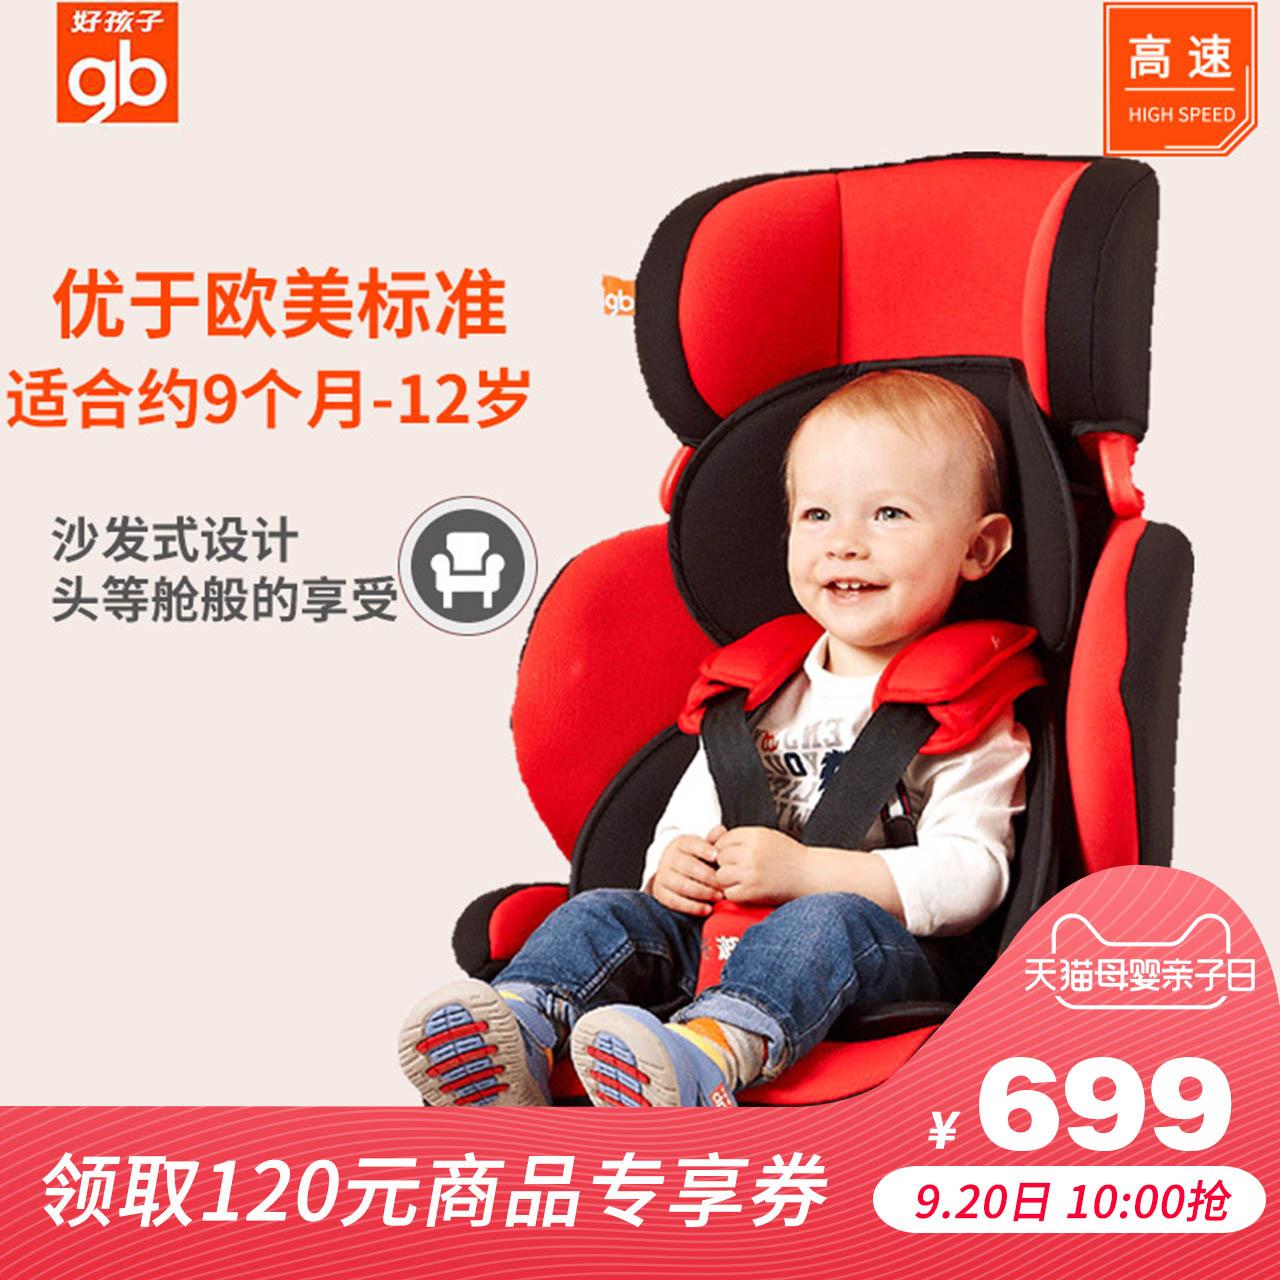 gb好孩子高速汽车儿童安全座椅汽车用宝宝安全座椅CS619